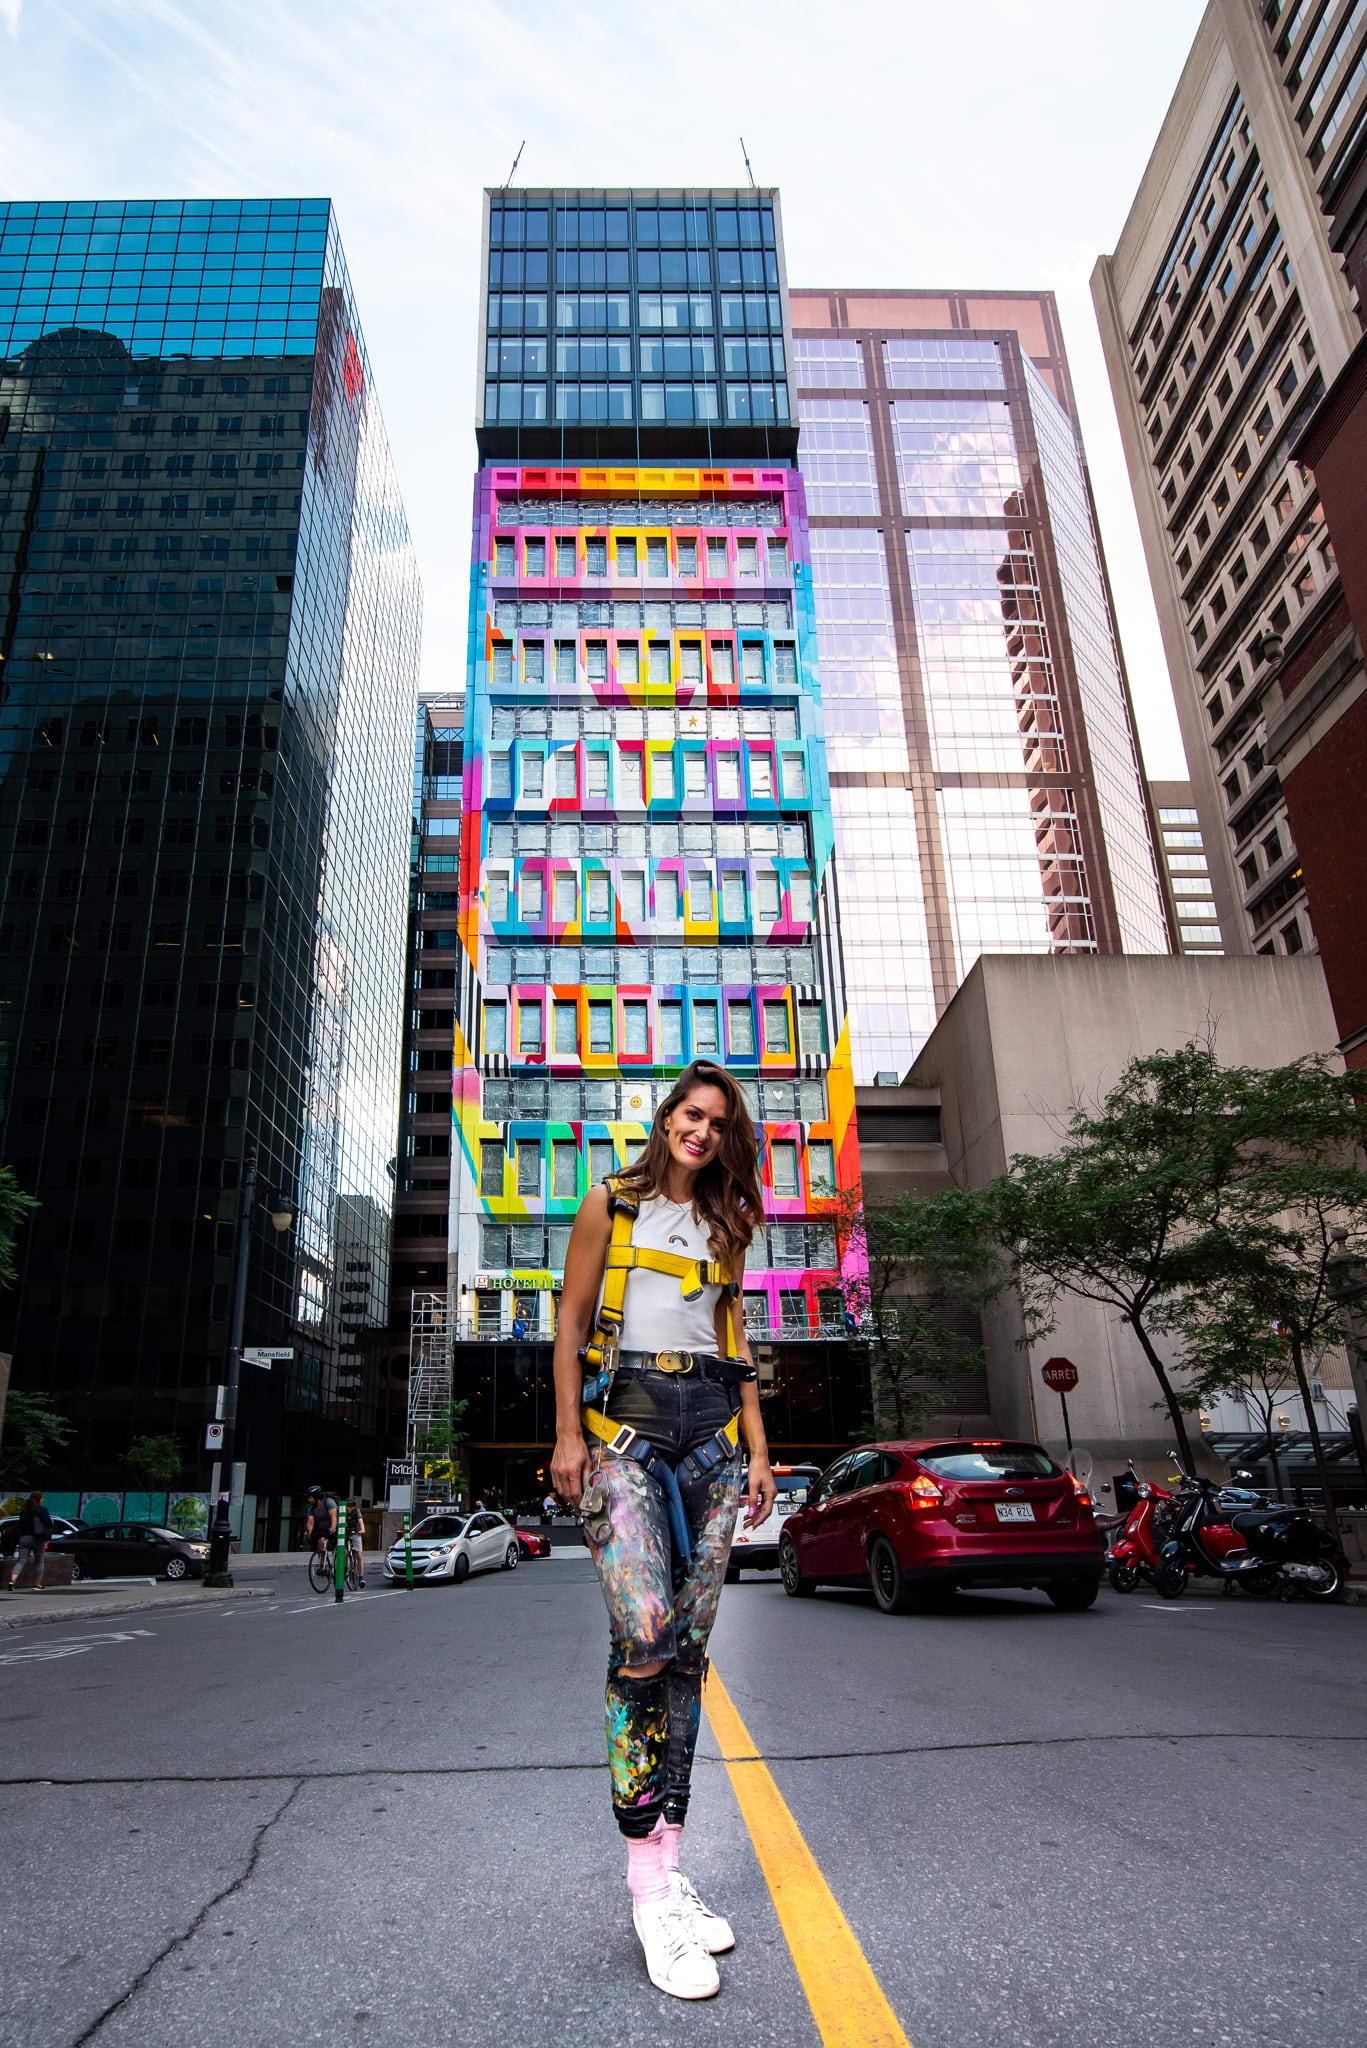 L'artiste Michelle Hoogveld posant devant sa murale